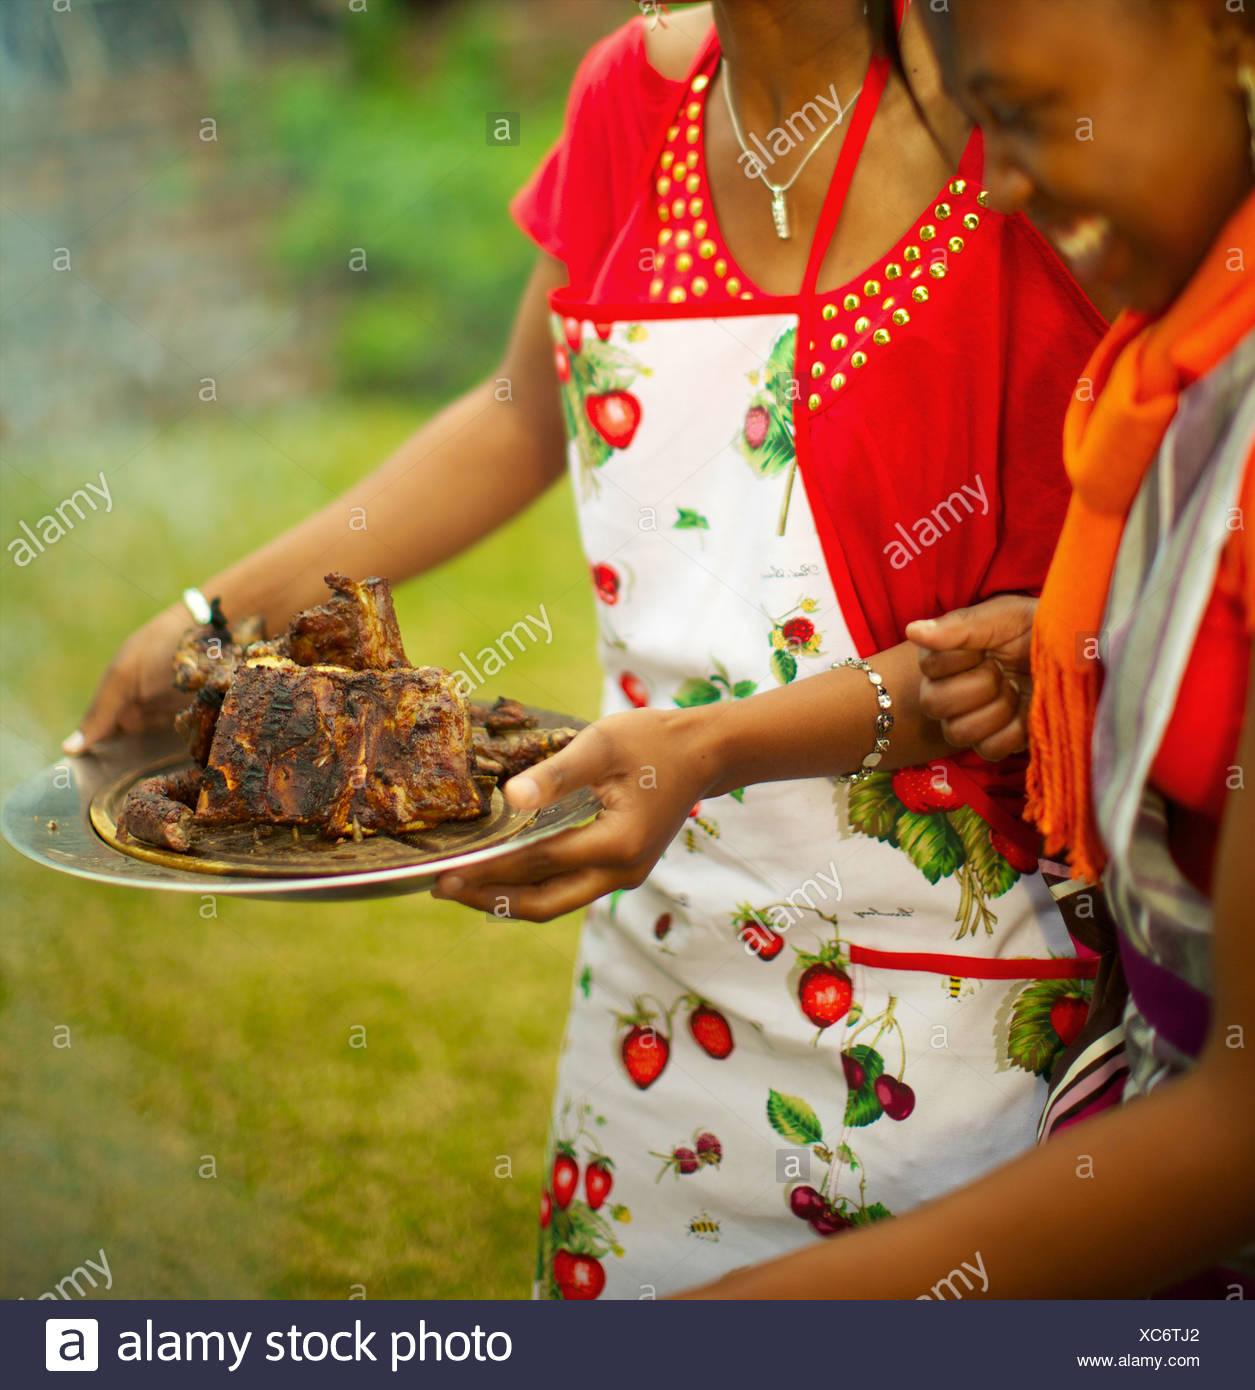 Giovani donne che serve carne cotta, KwaZulu-Natal, Sud Africa Immagini Stock